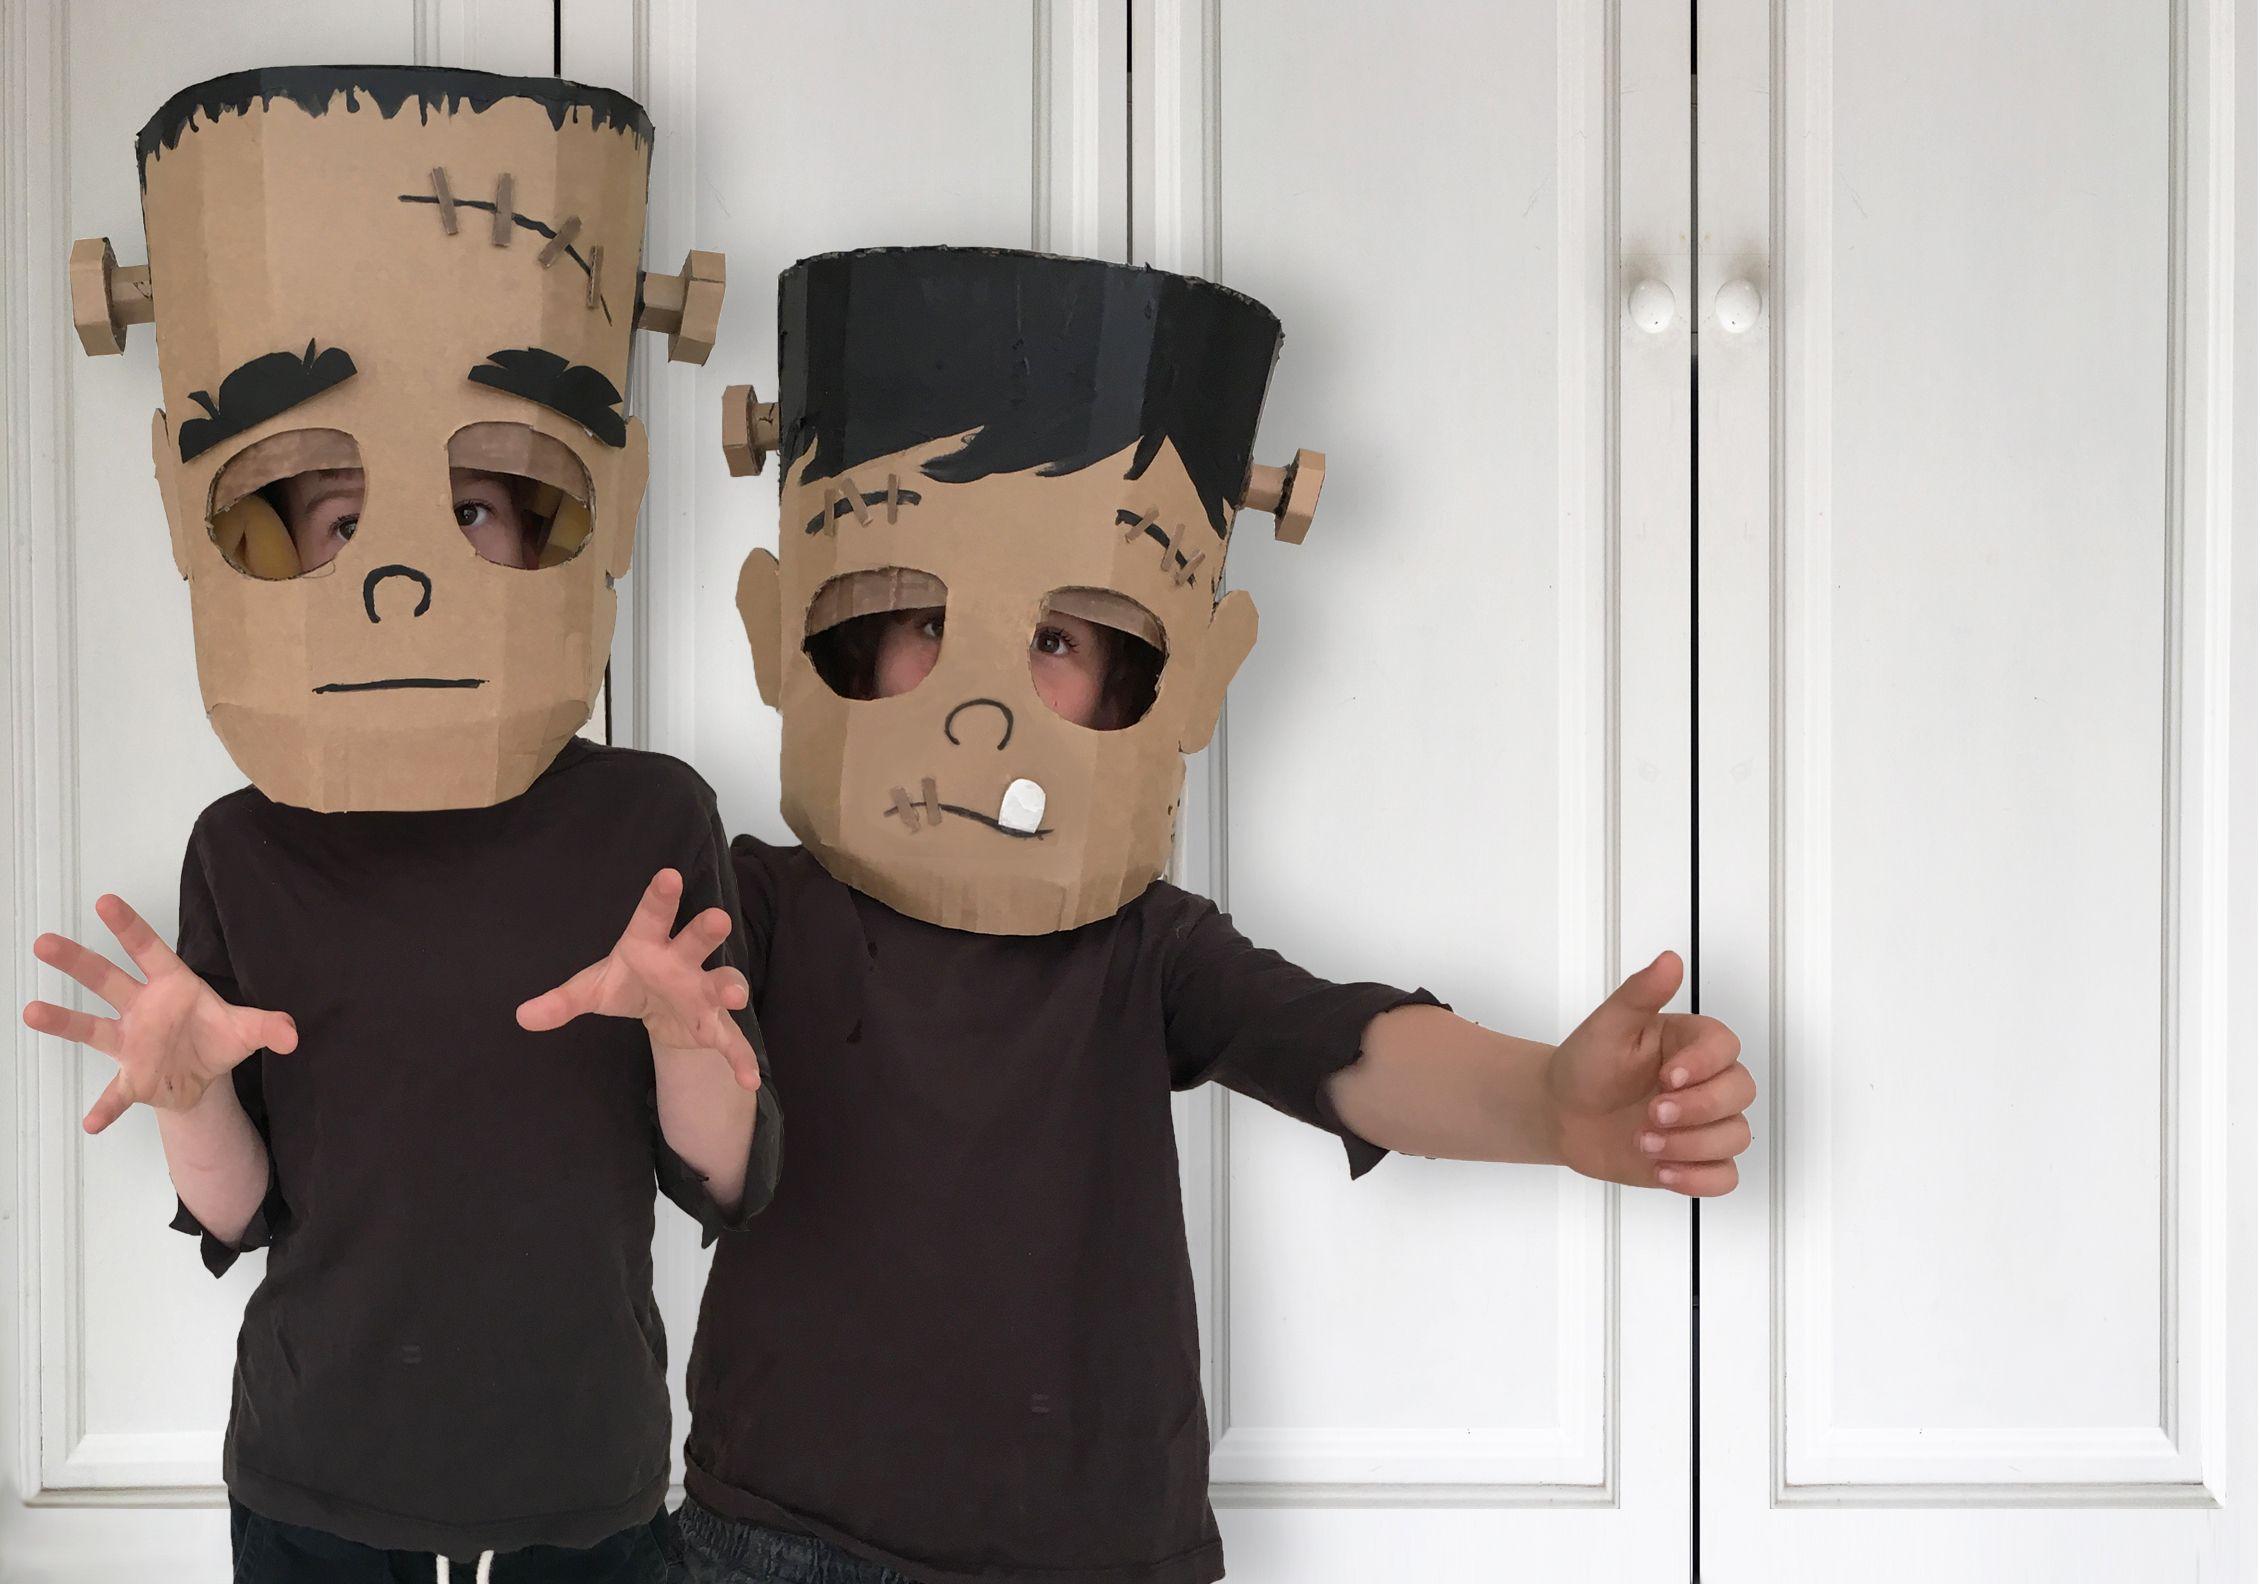 Diy Frankenstein Costume Cardboard Costume Diy Costumes Kids Frankenstein Costume